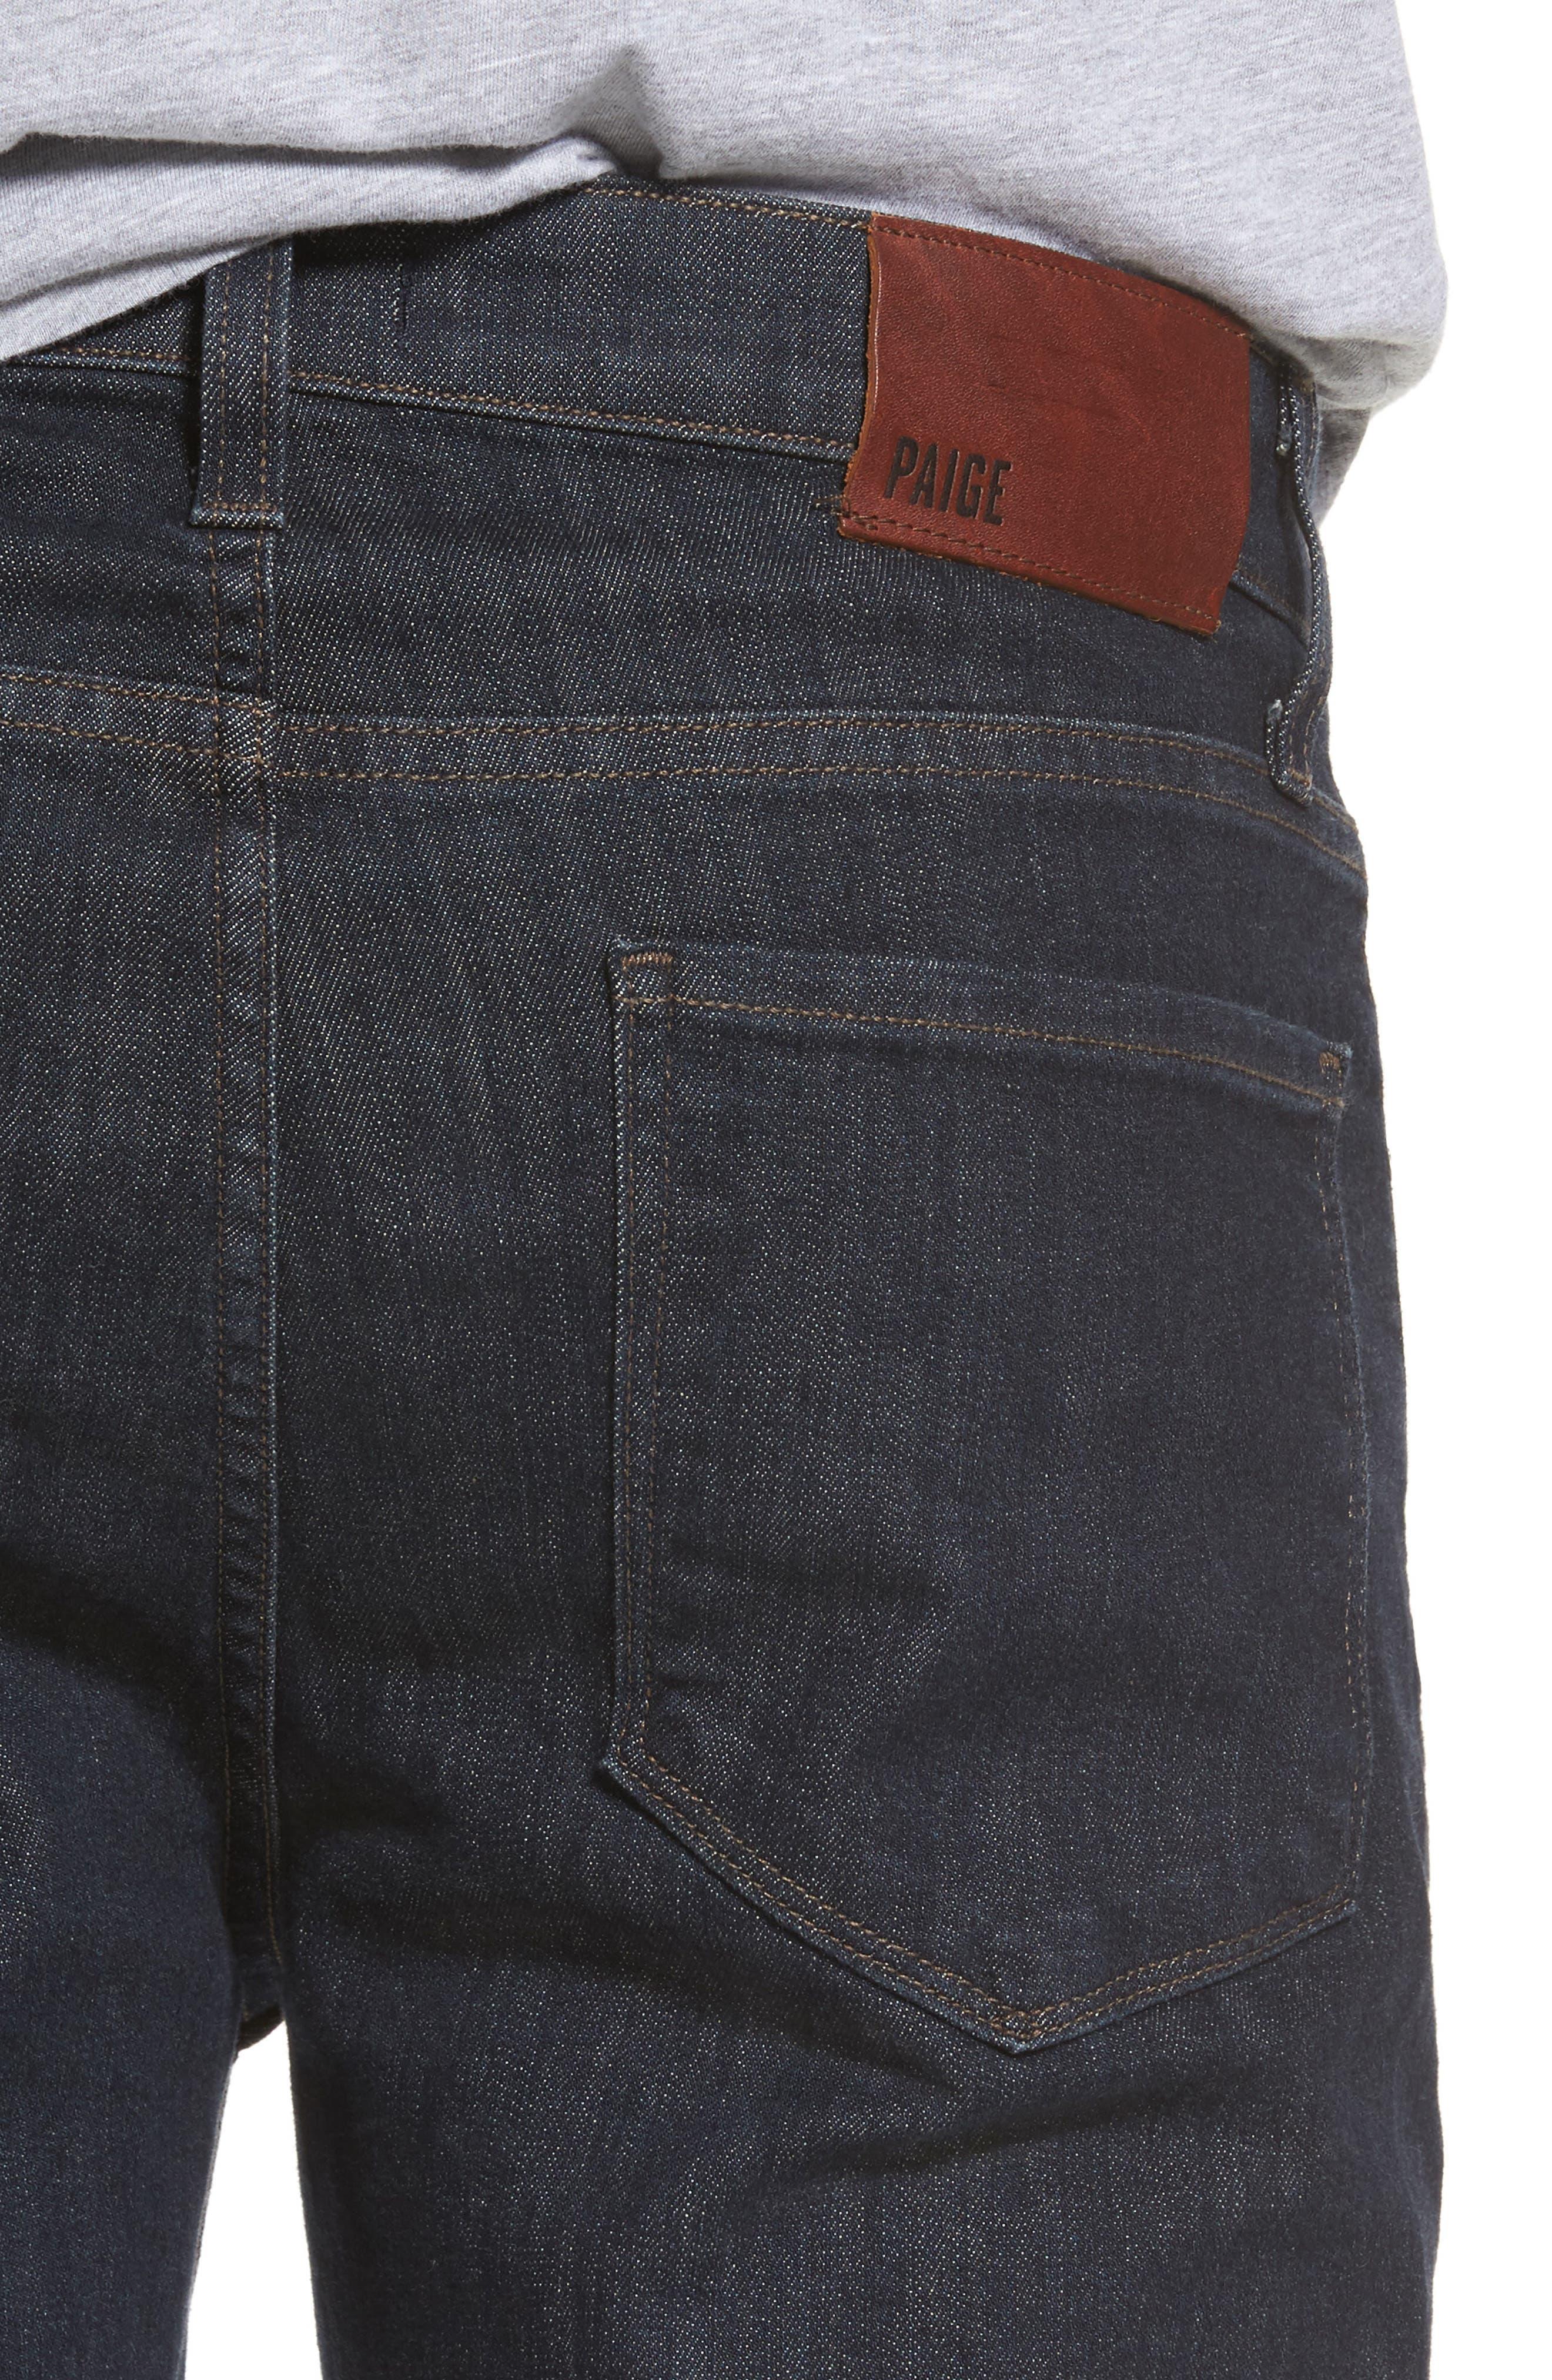 Legacy - Croft Skinny Fit Jeans,                             Alternate thumbnail 4, color,                             Filmore